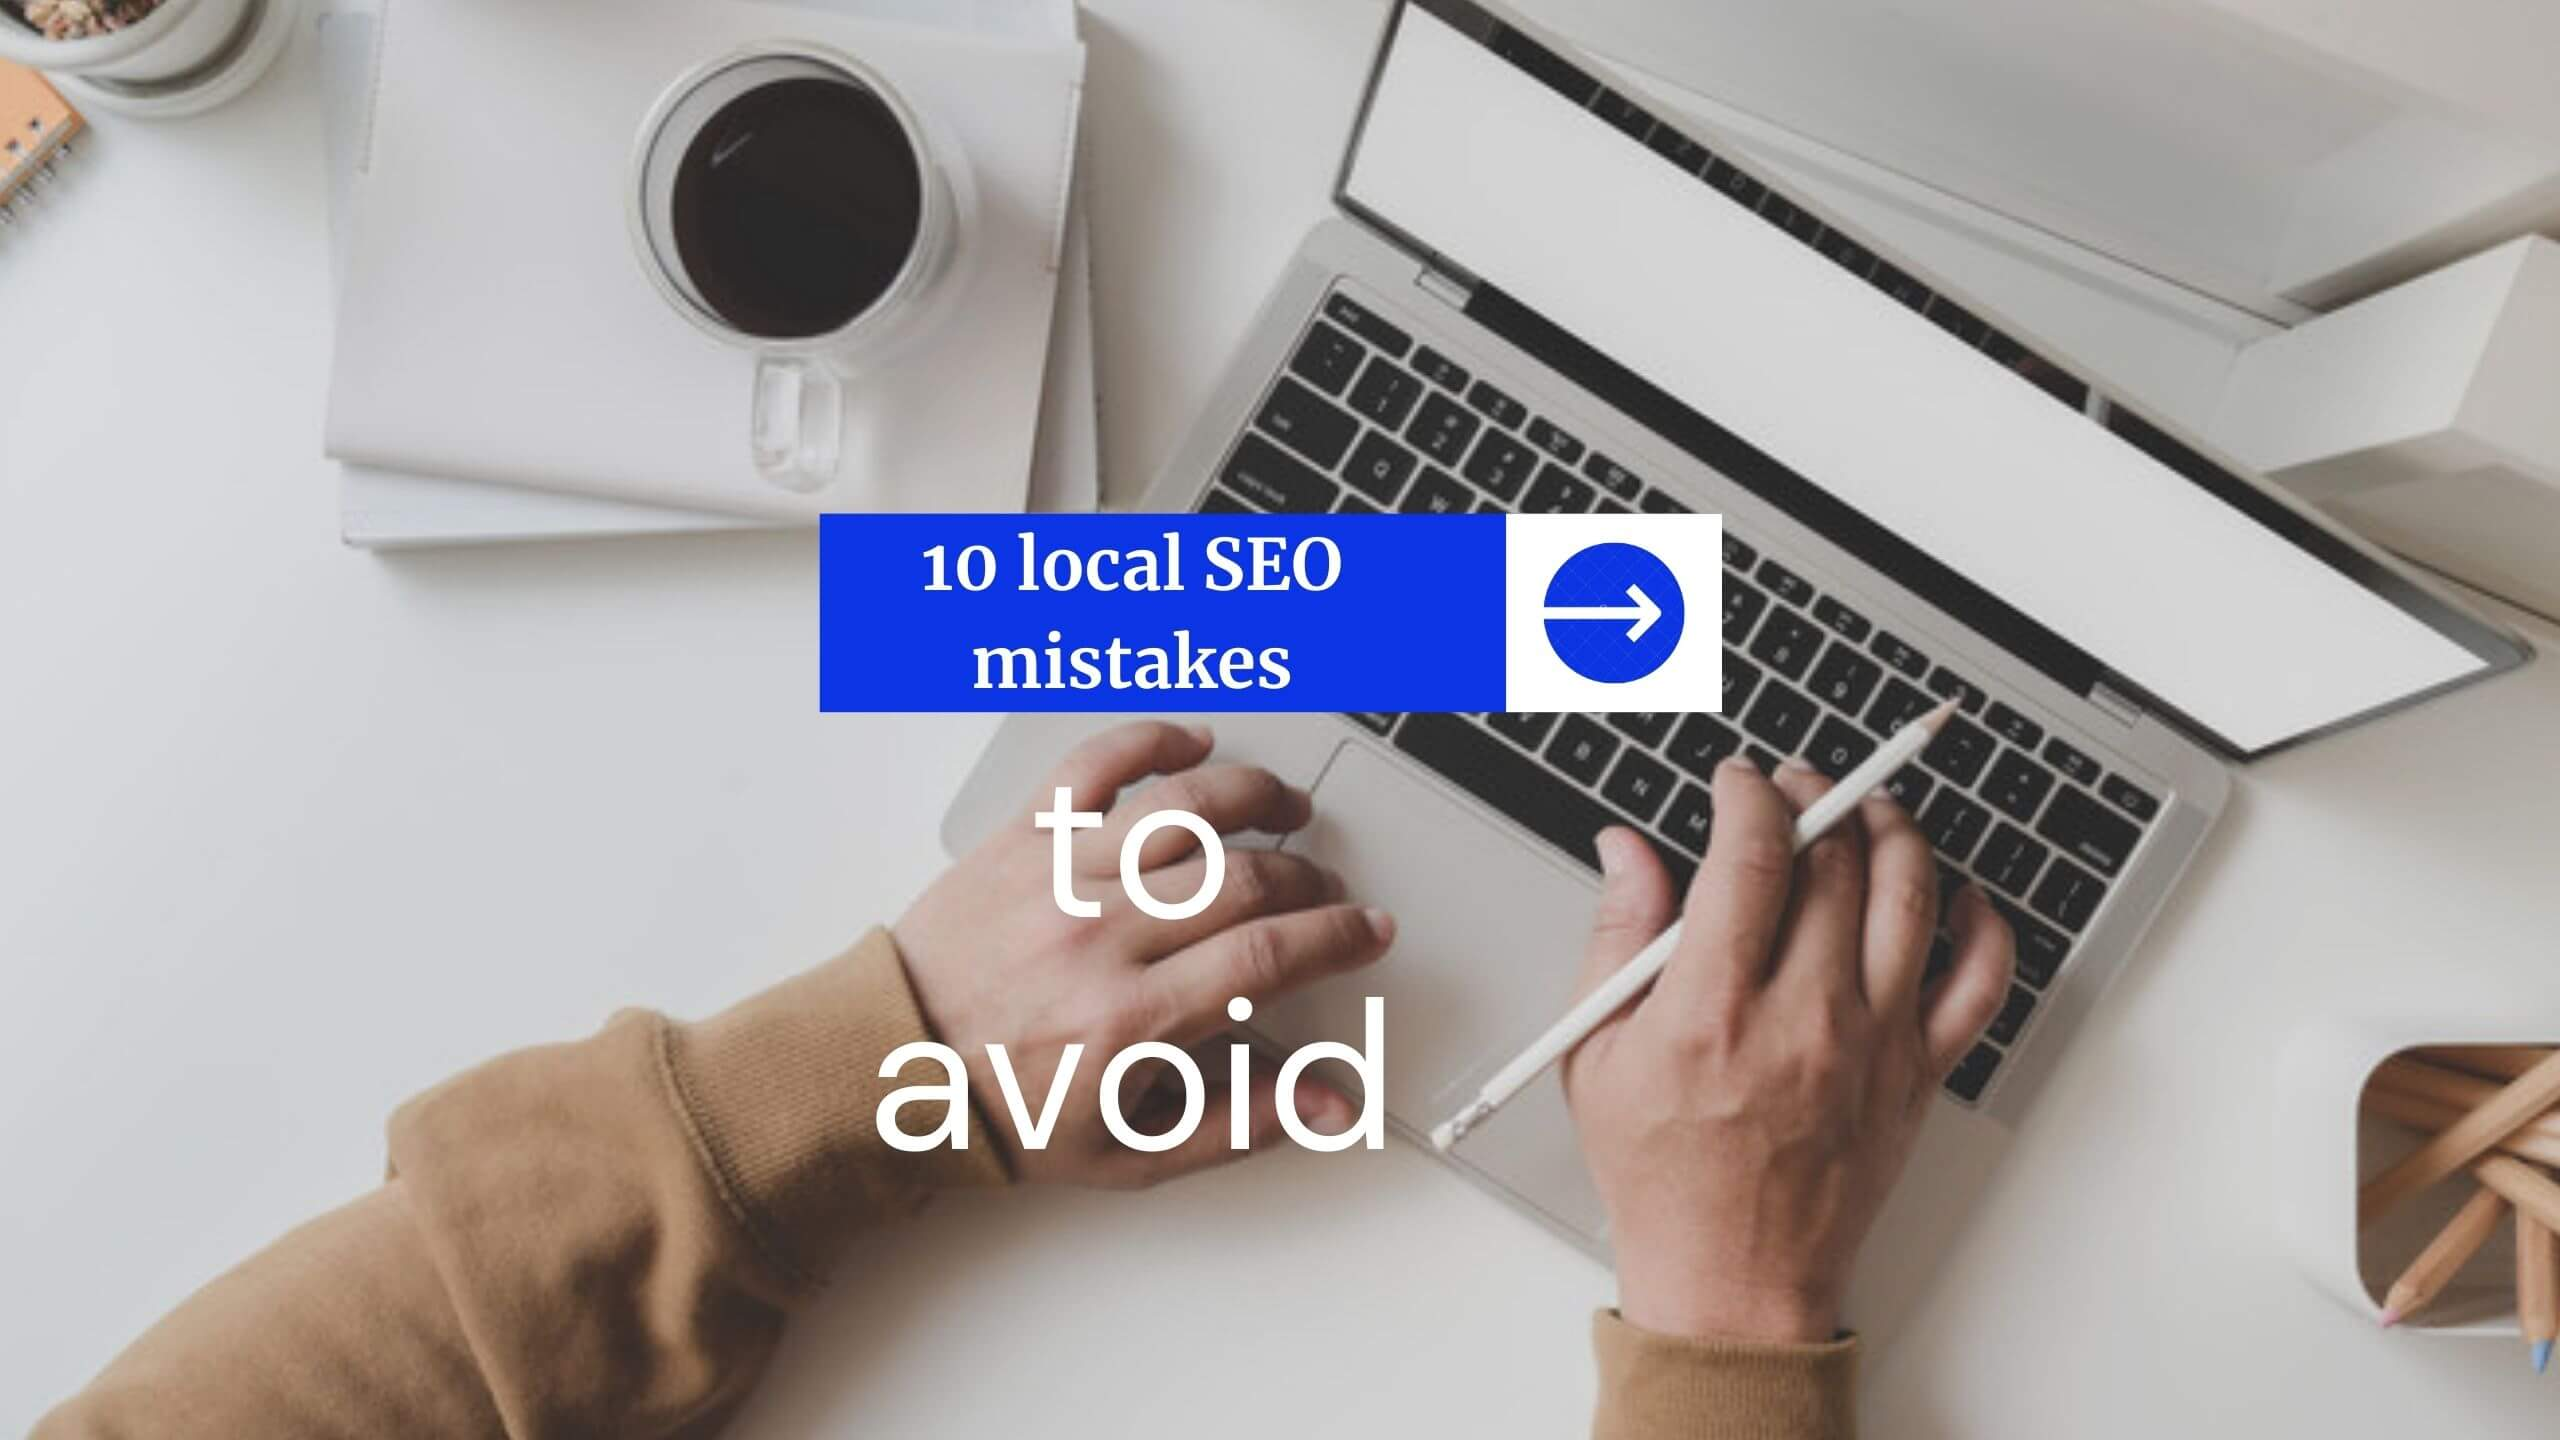 10 Local SEO Mistakes to Avoid